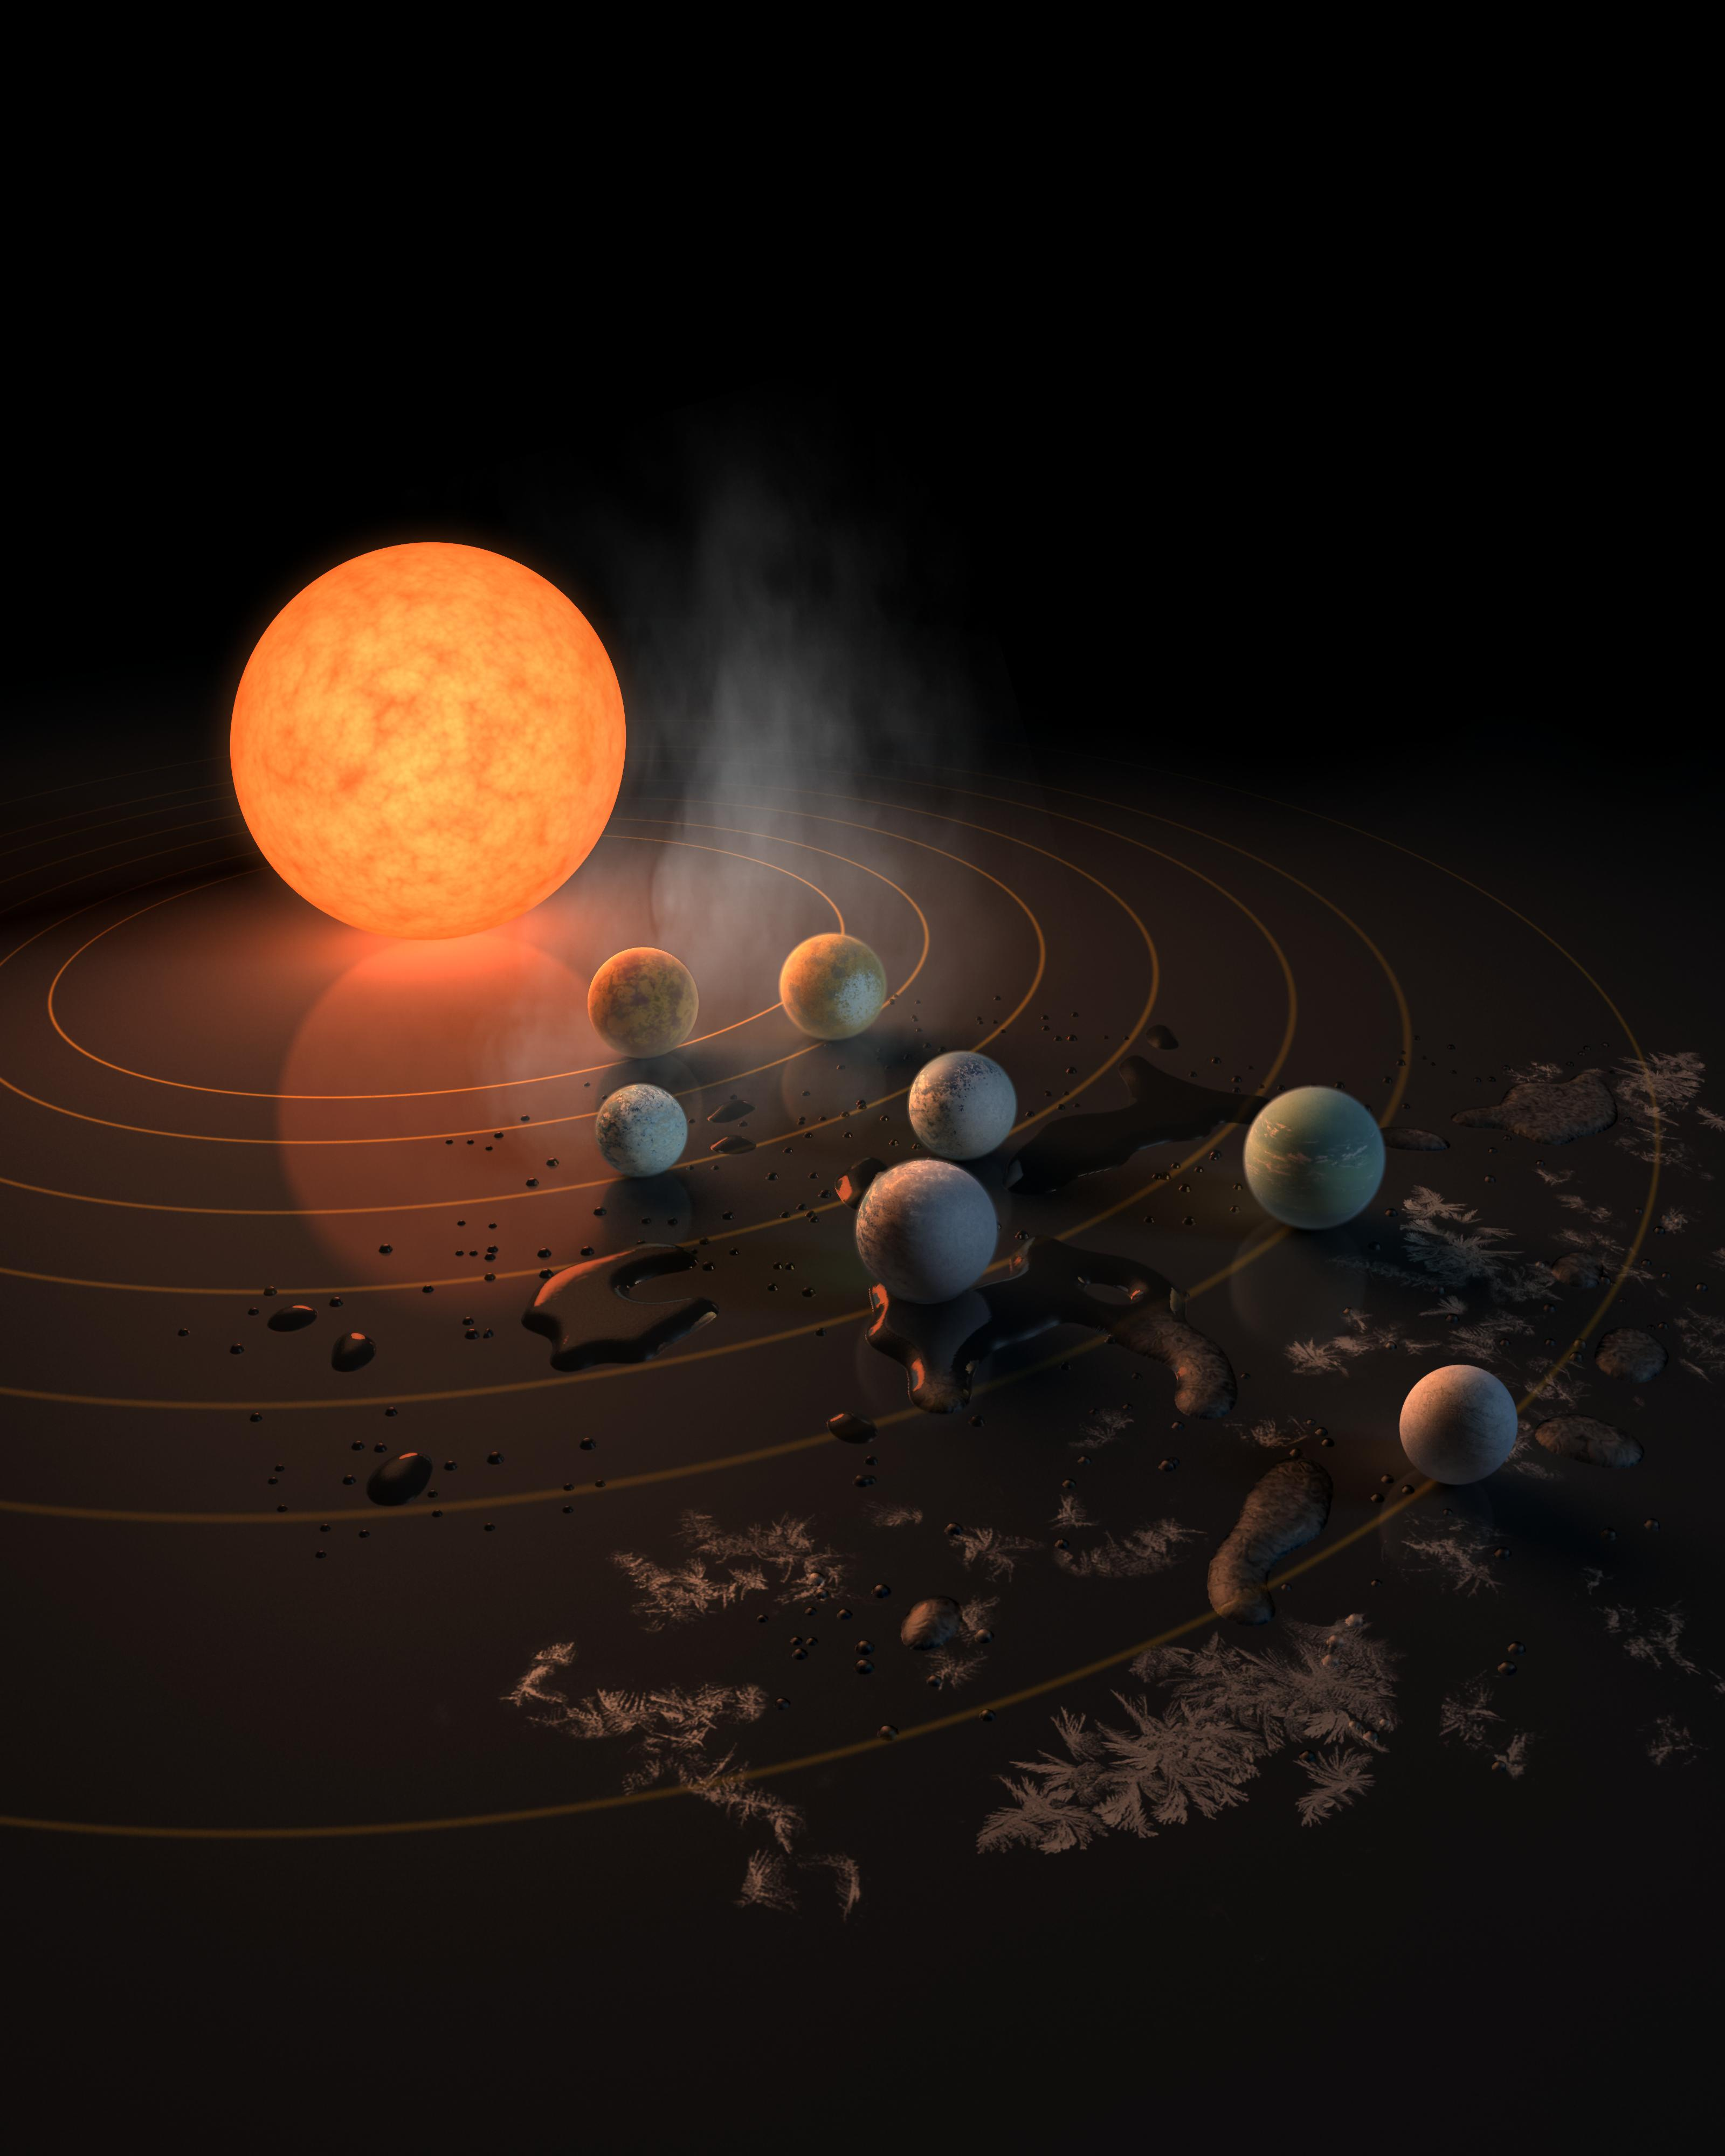 Spitzer Observes TRAPPIST-1